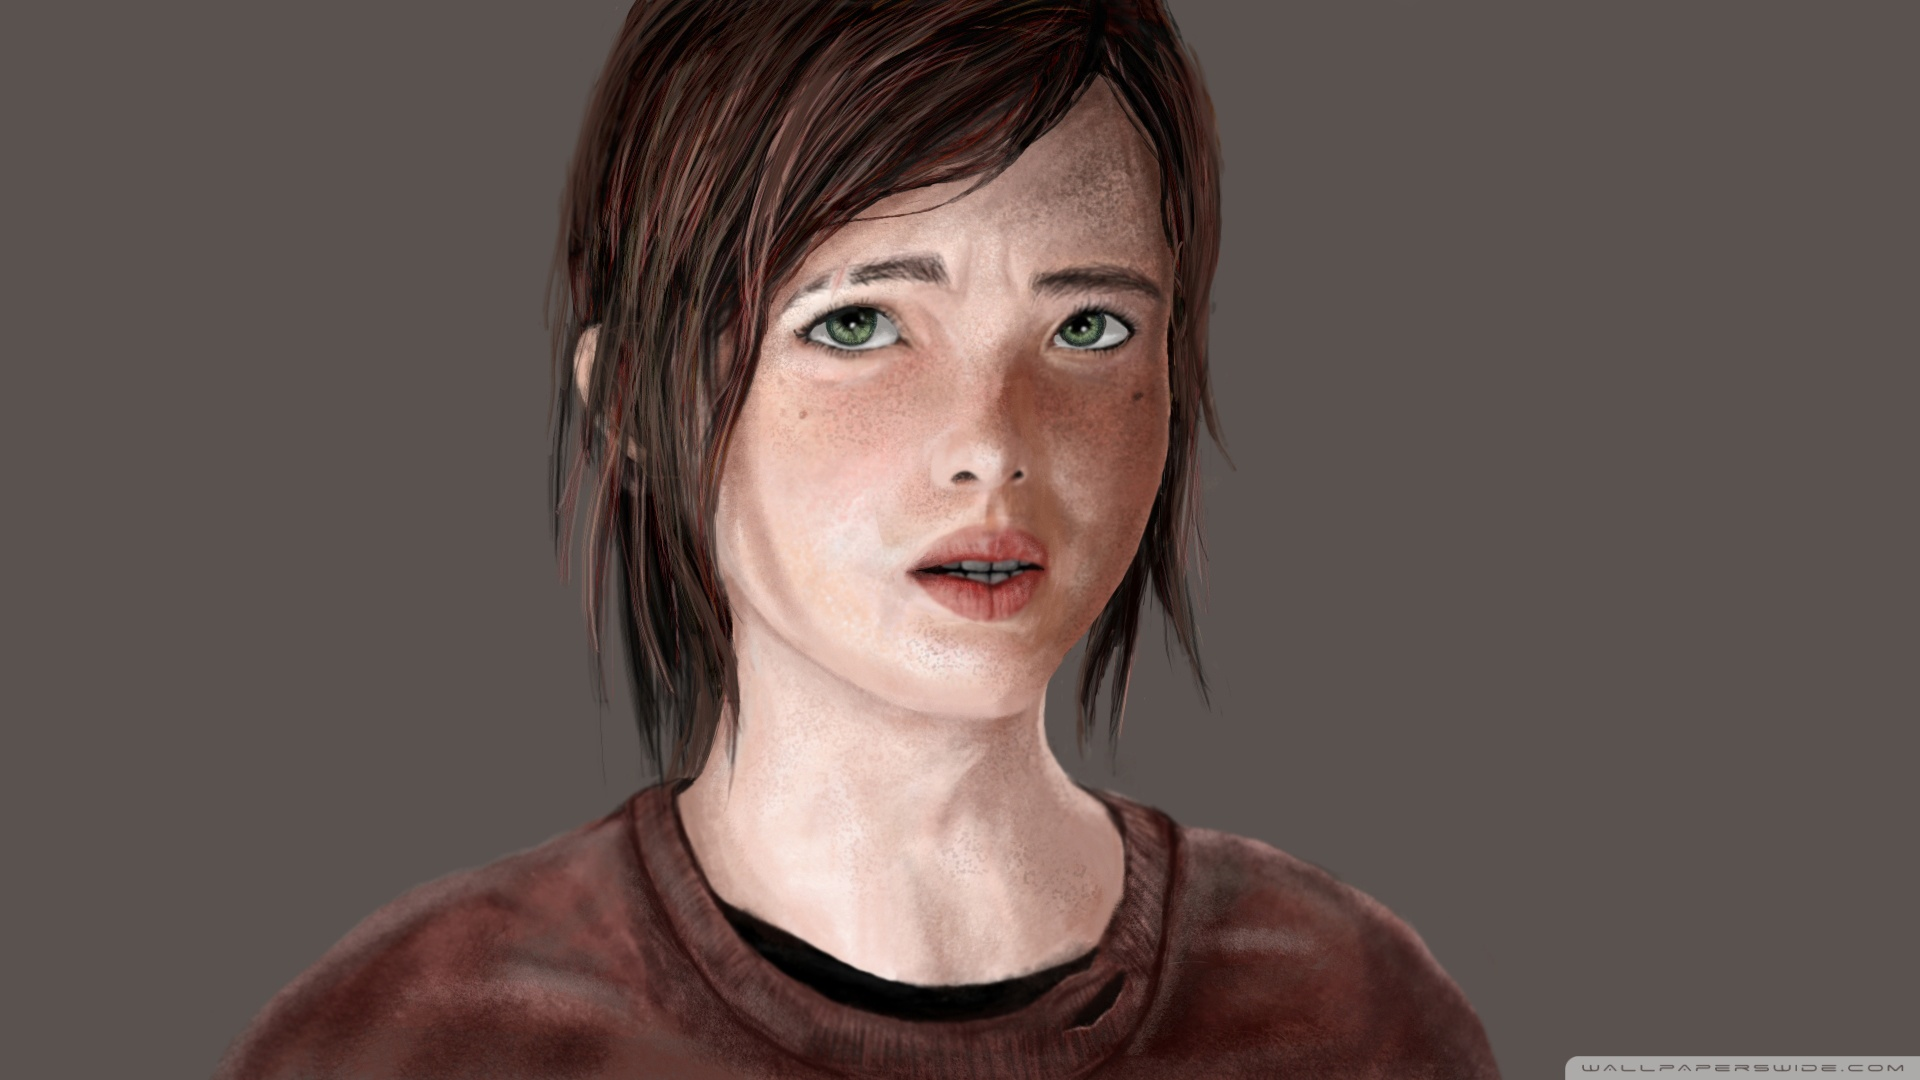 The Last Of Us Ellie Wallpaper 1920x1080 The Last Of Us Ellie 1920x1080